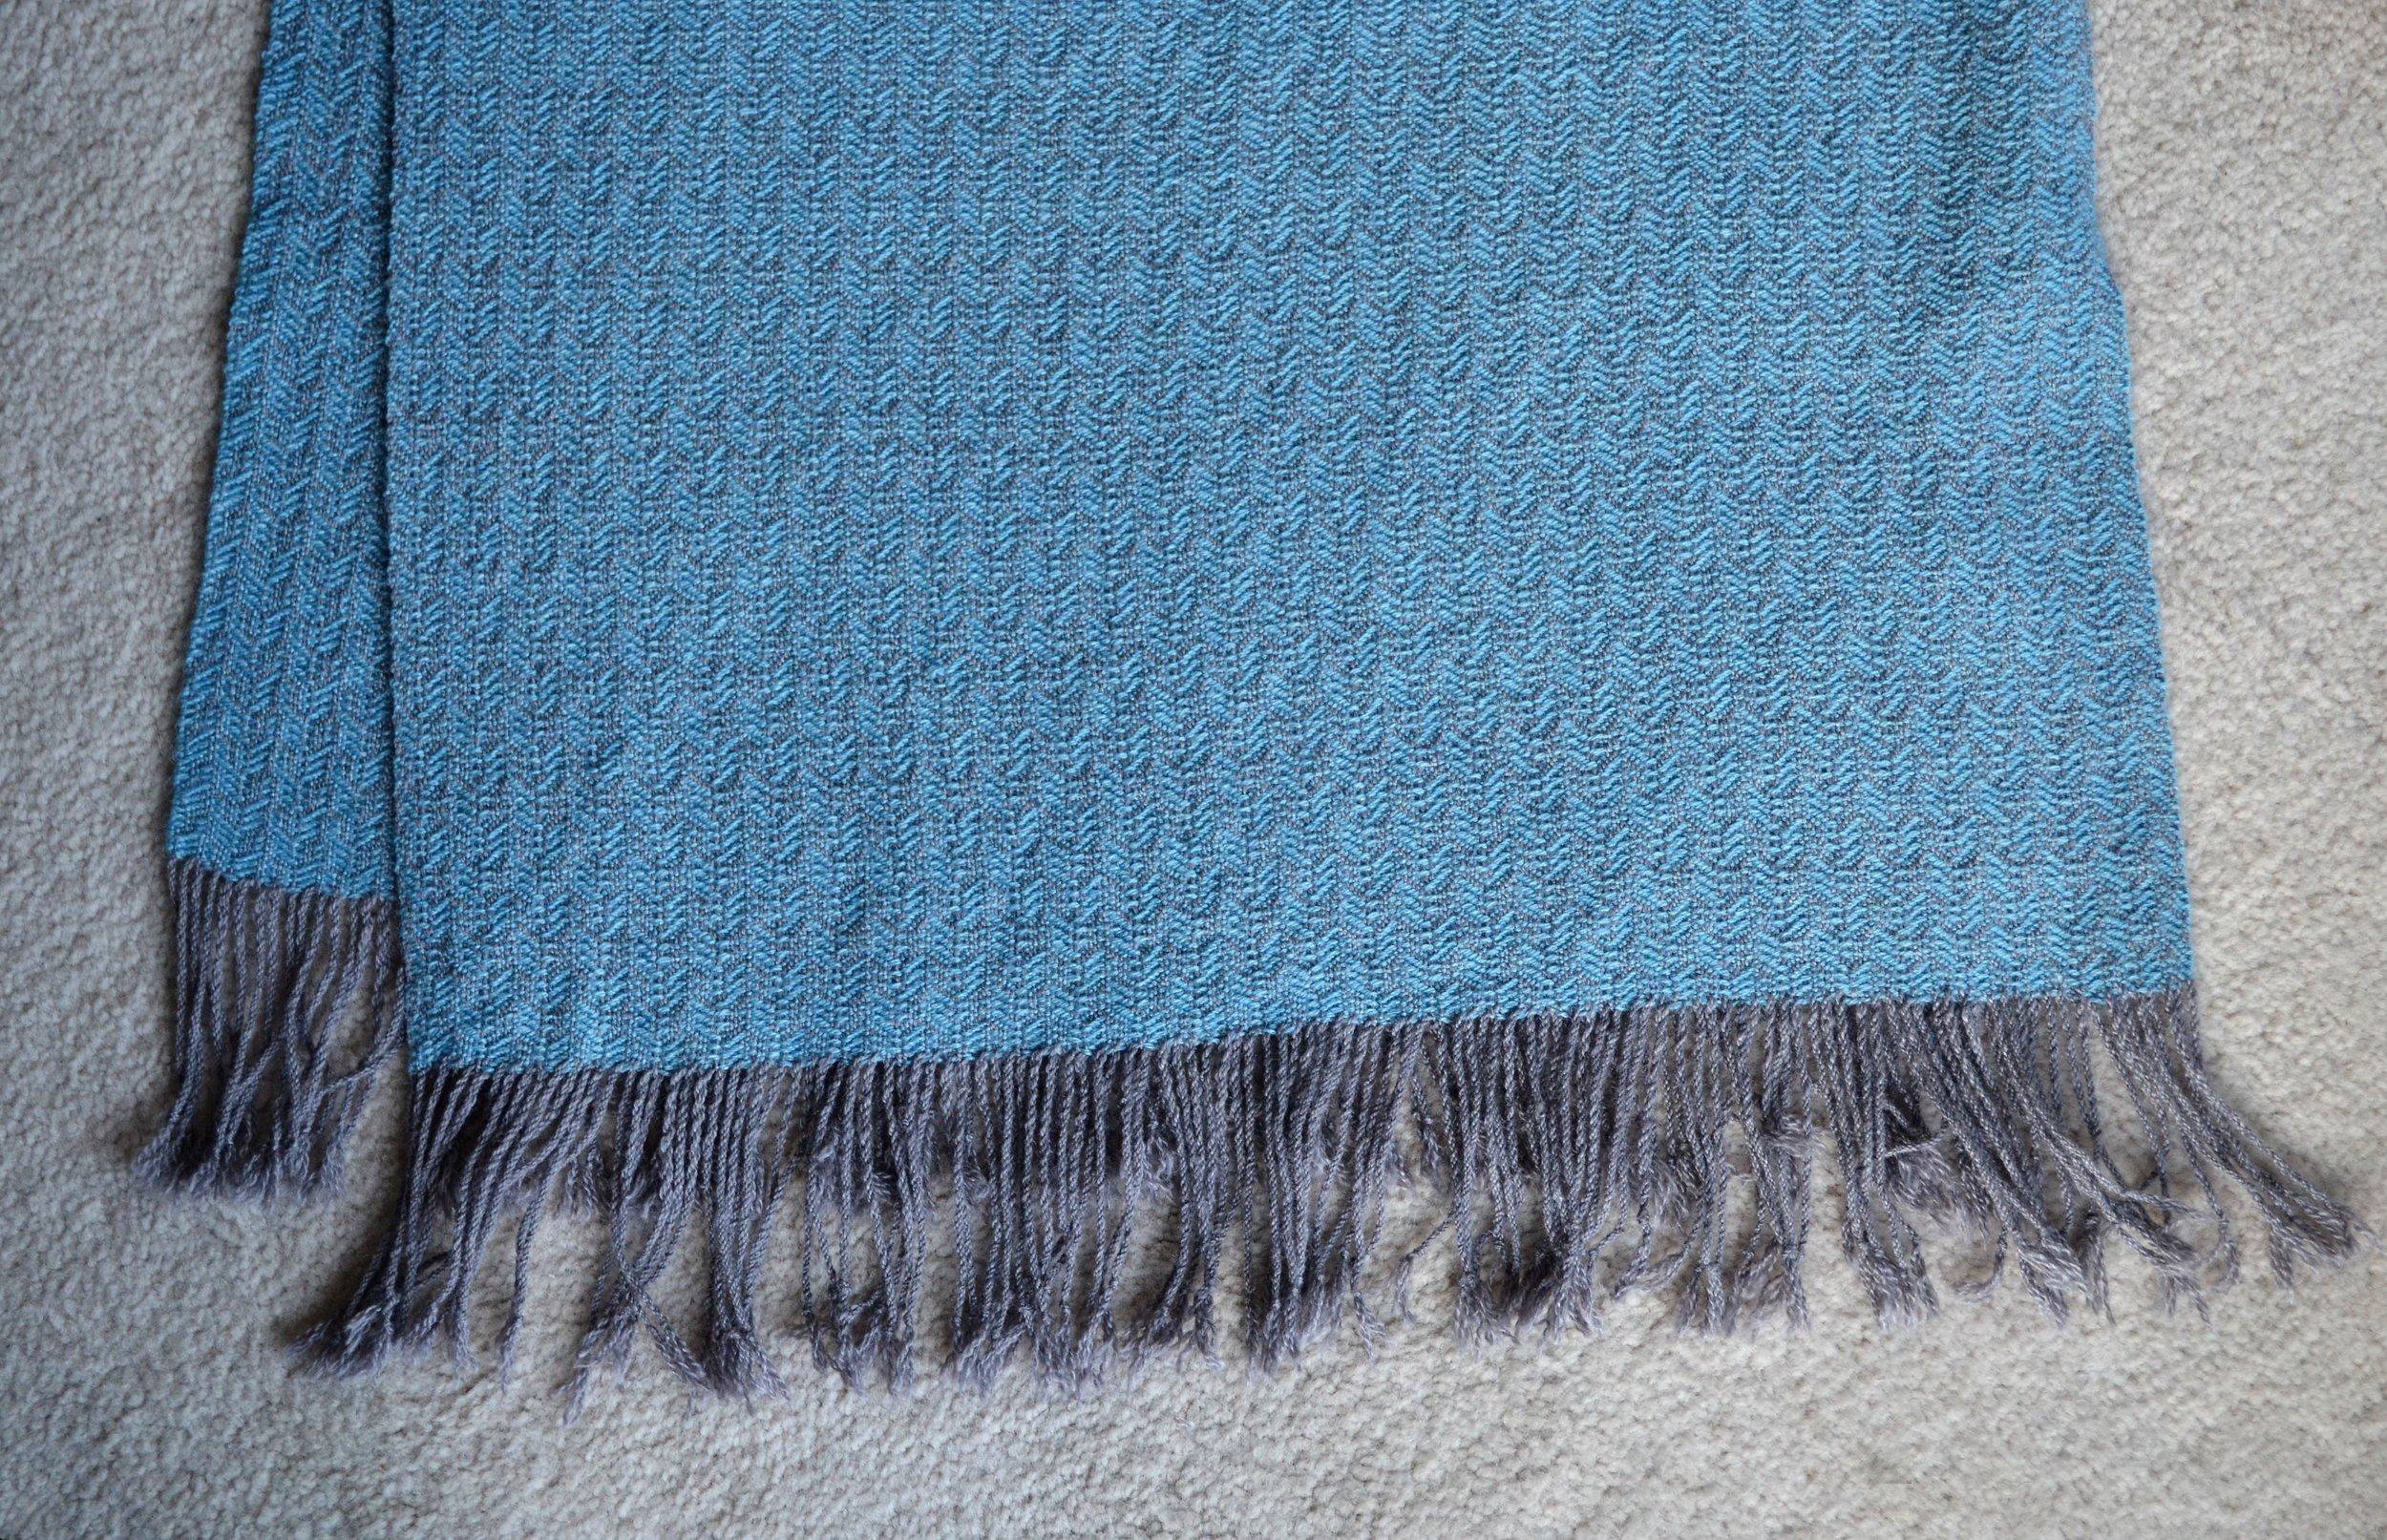 blanket scarf handwoven on 8 shaft weaving loom / warporweft.com